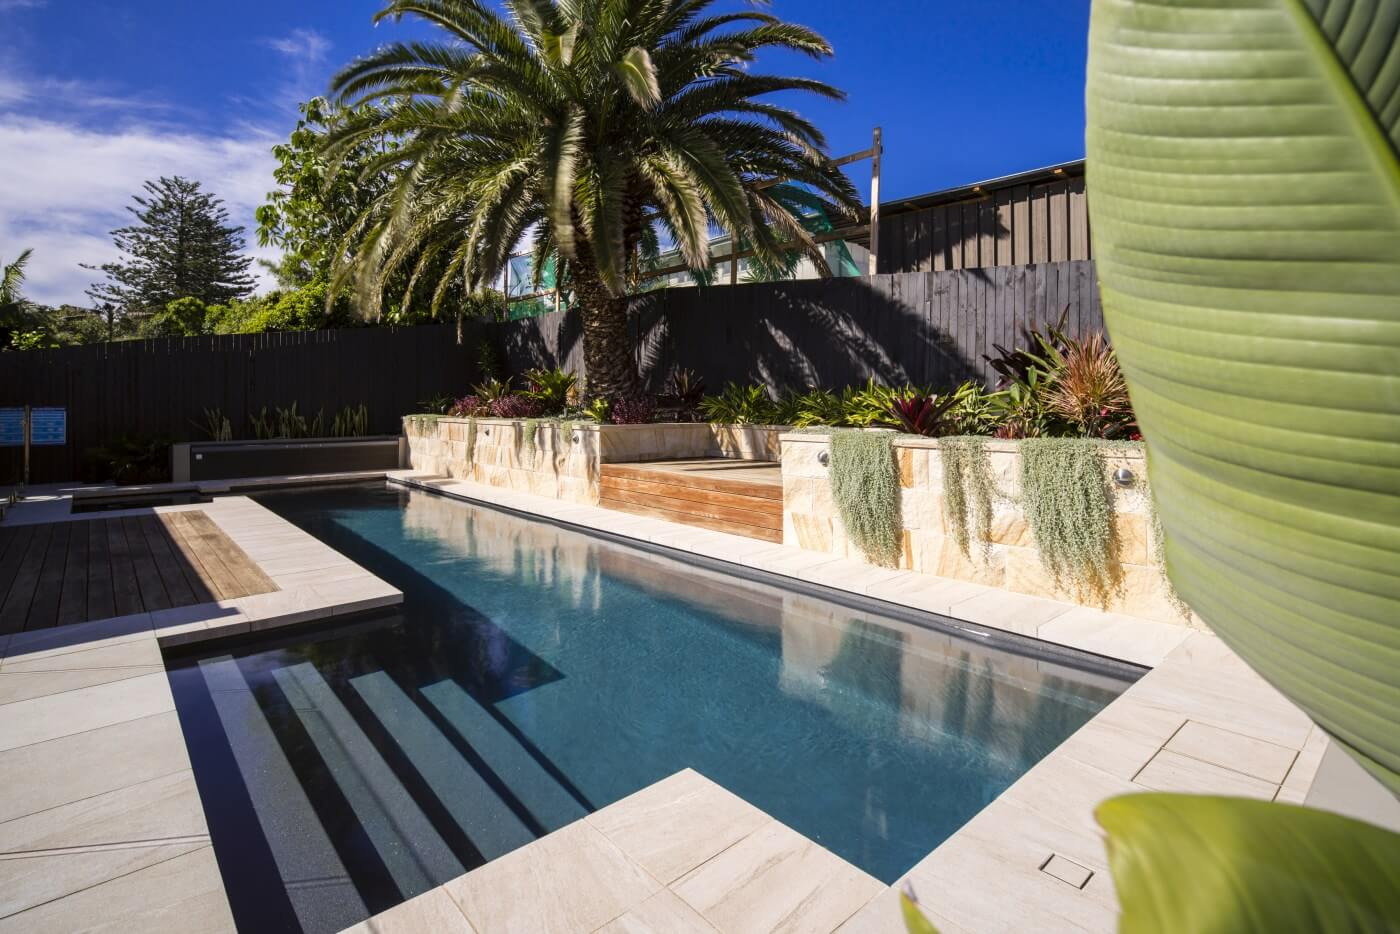 Fastlane Lap Pool | Compass Pools Sydney - Central Coast